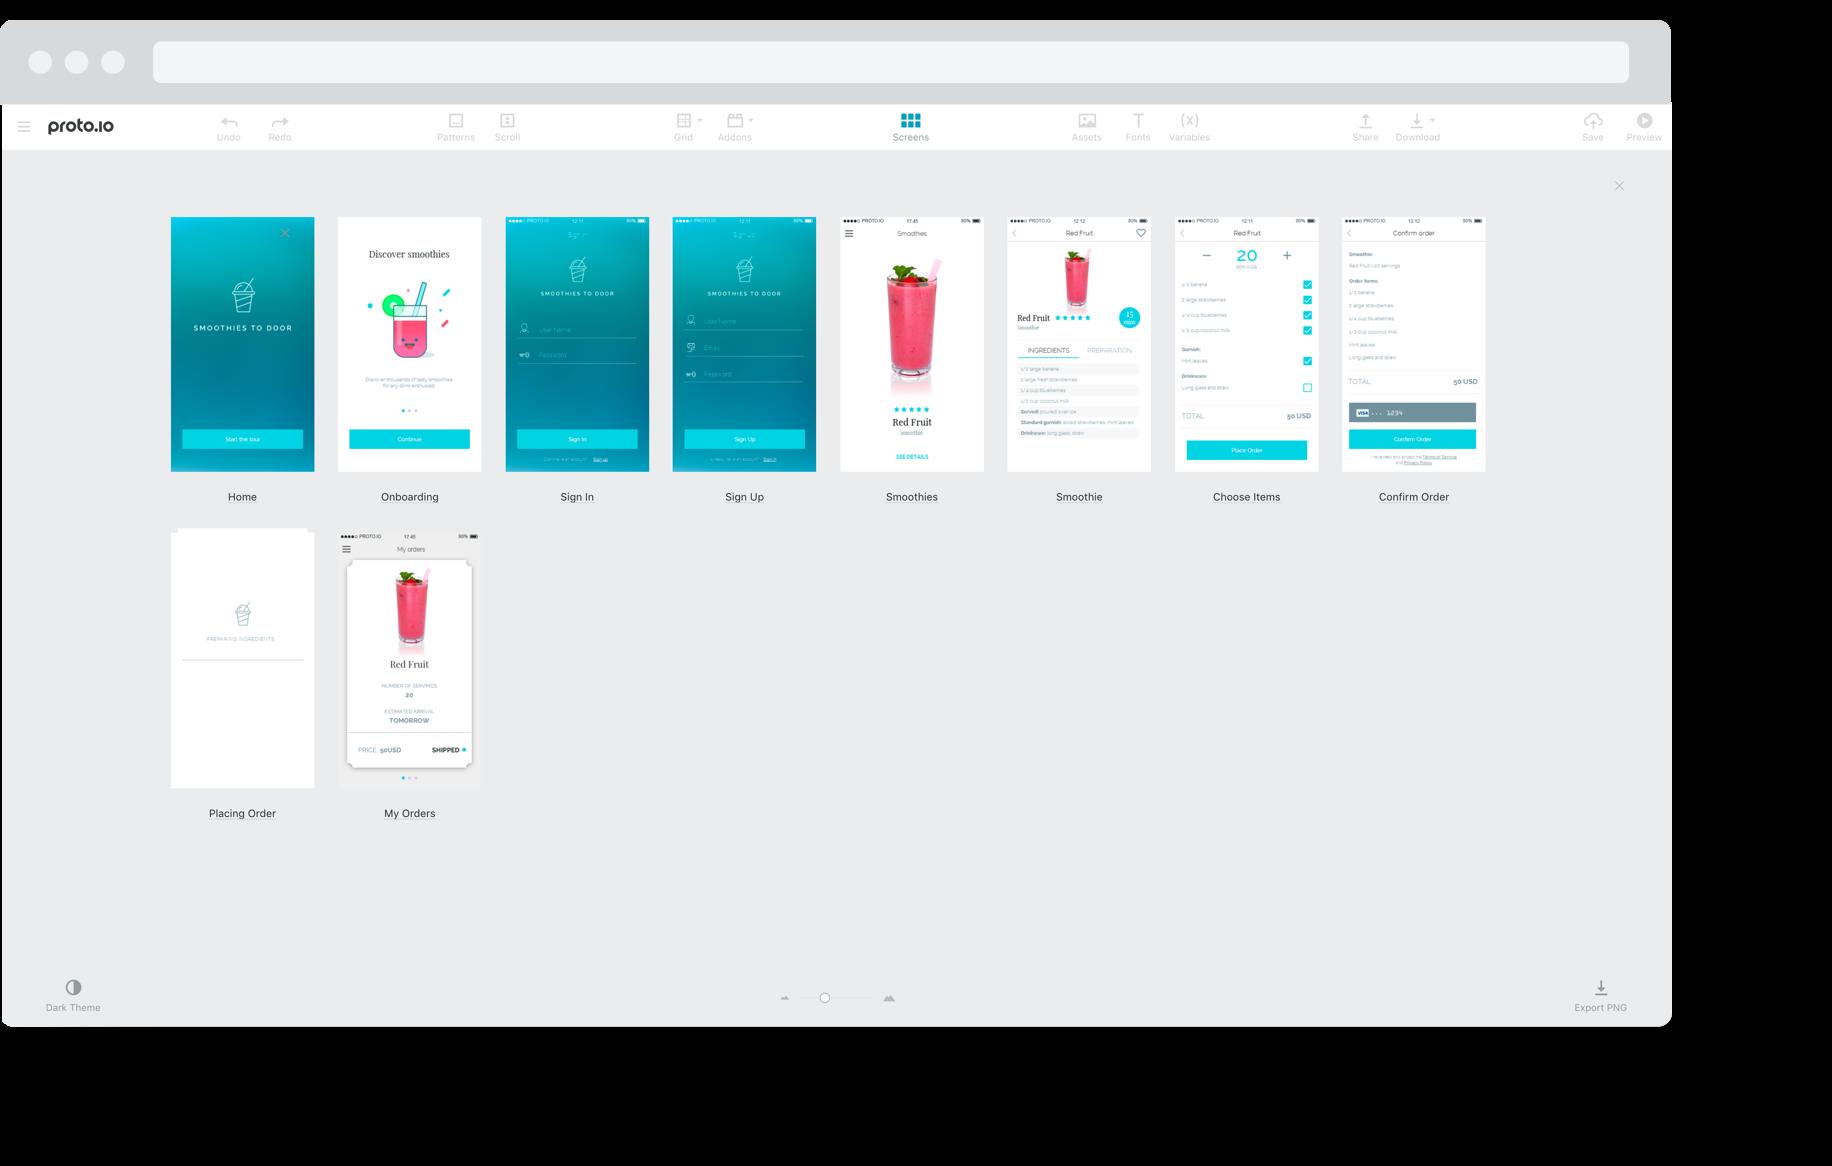 Proto.io editor - Visual Screens Navigator